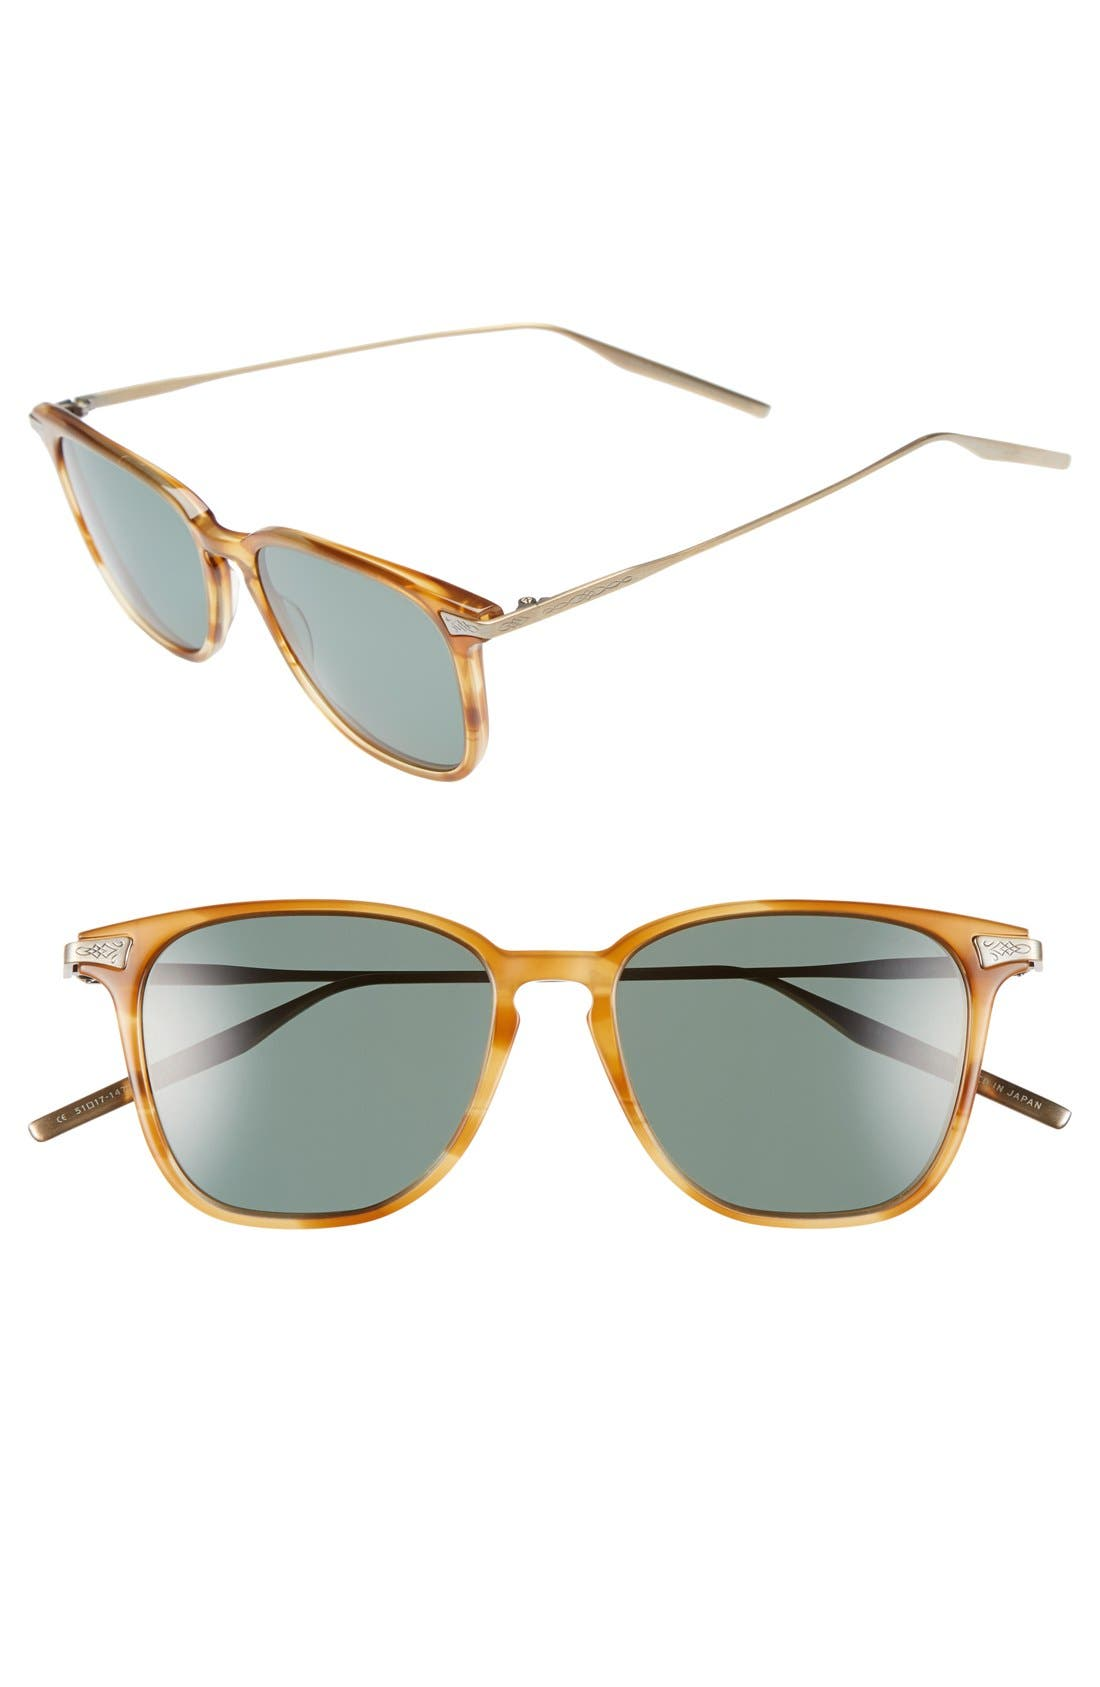 SALT.,                             Ridgeway 51mm Polarized Sunglasses,                             Main thumbnail 1, color,                             SIENNA/ GREY